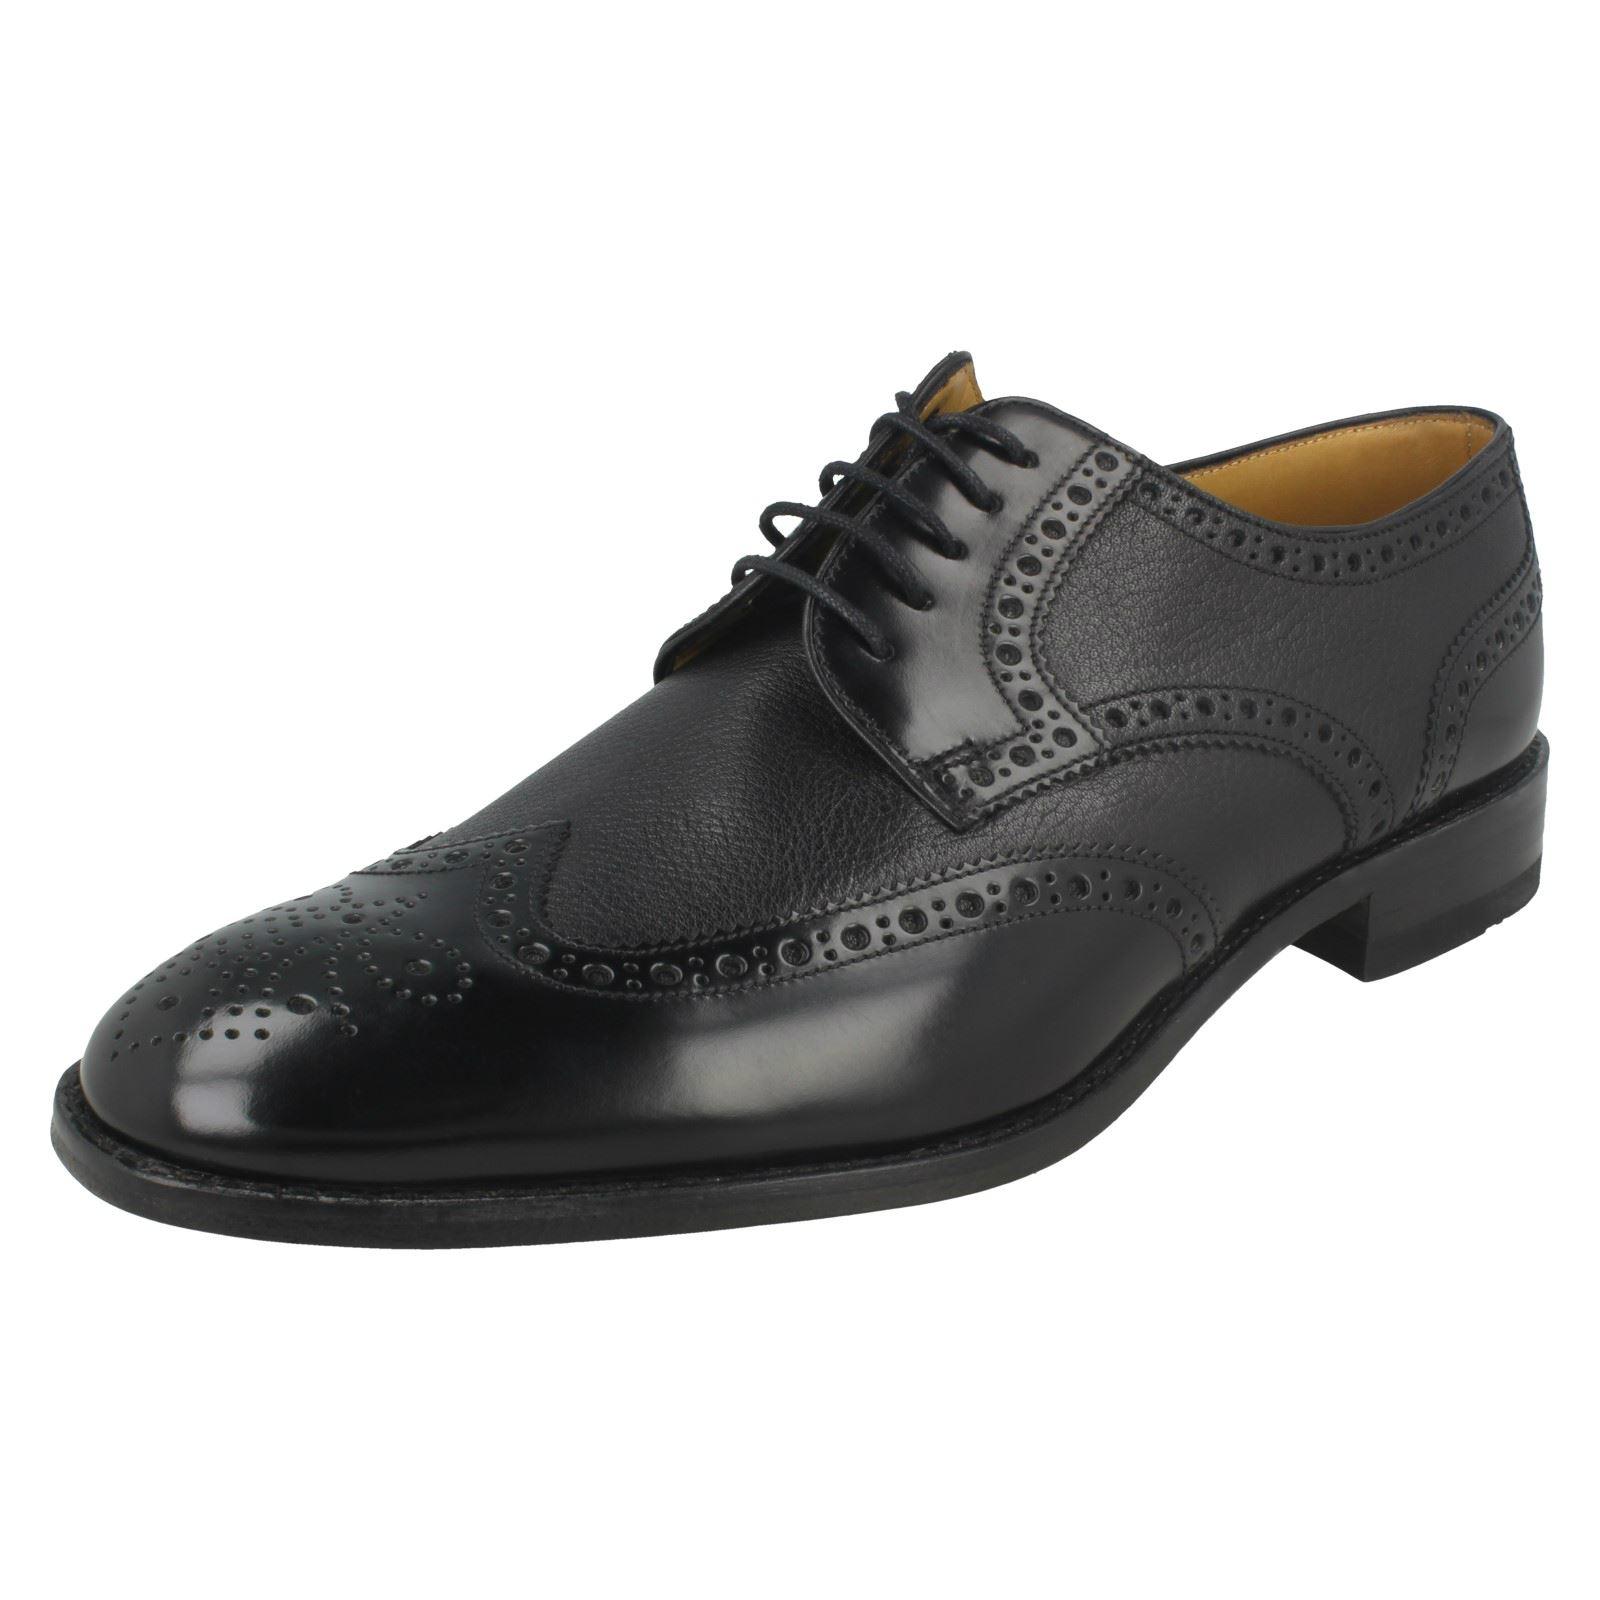 Herren Loake Brogue Schuhes Arlington 27be49